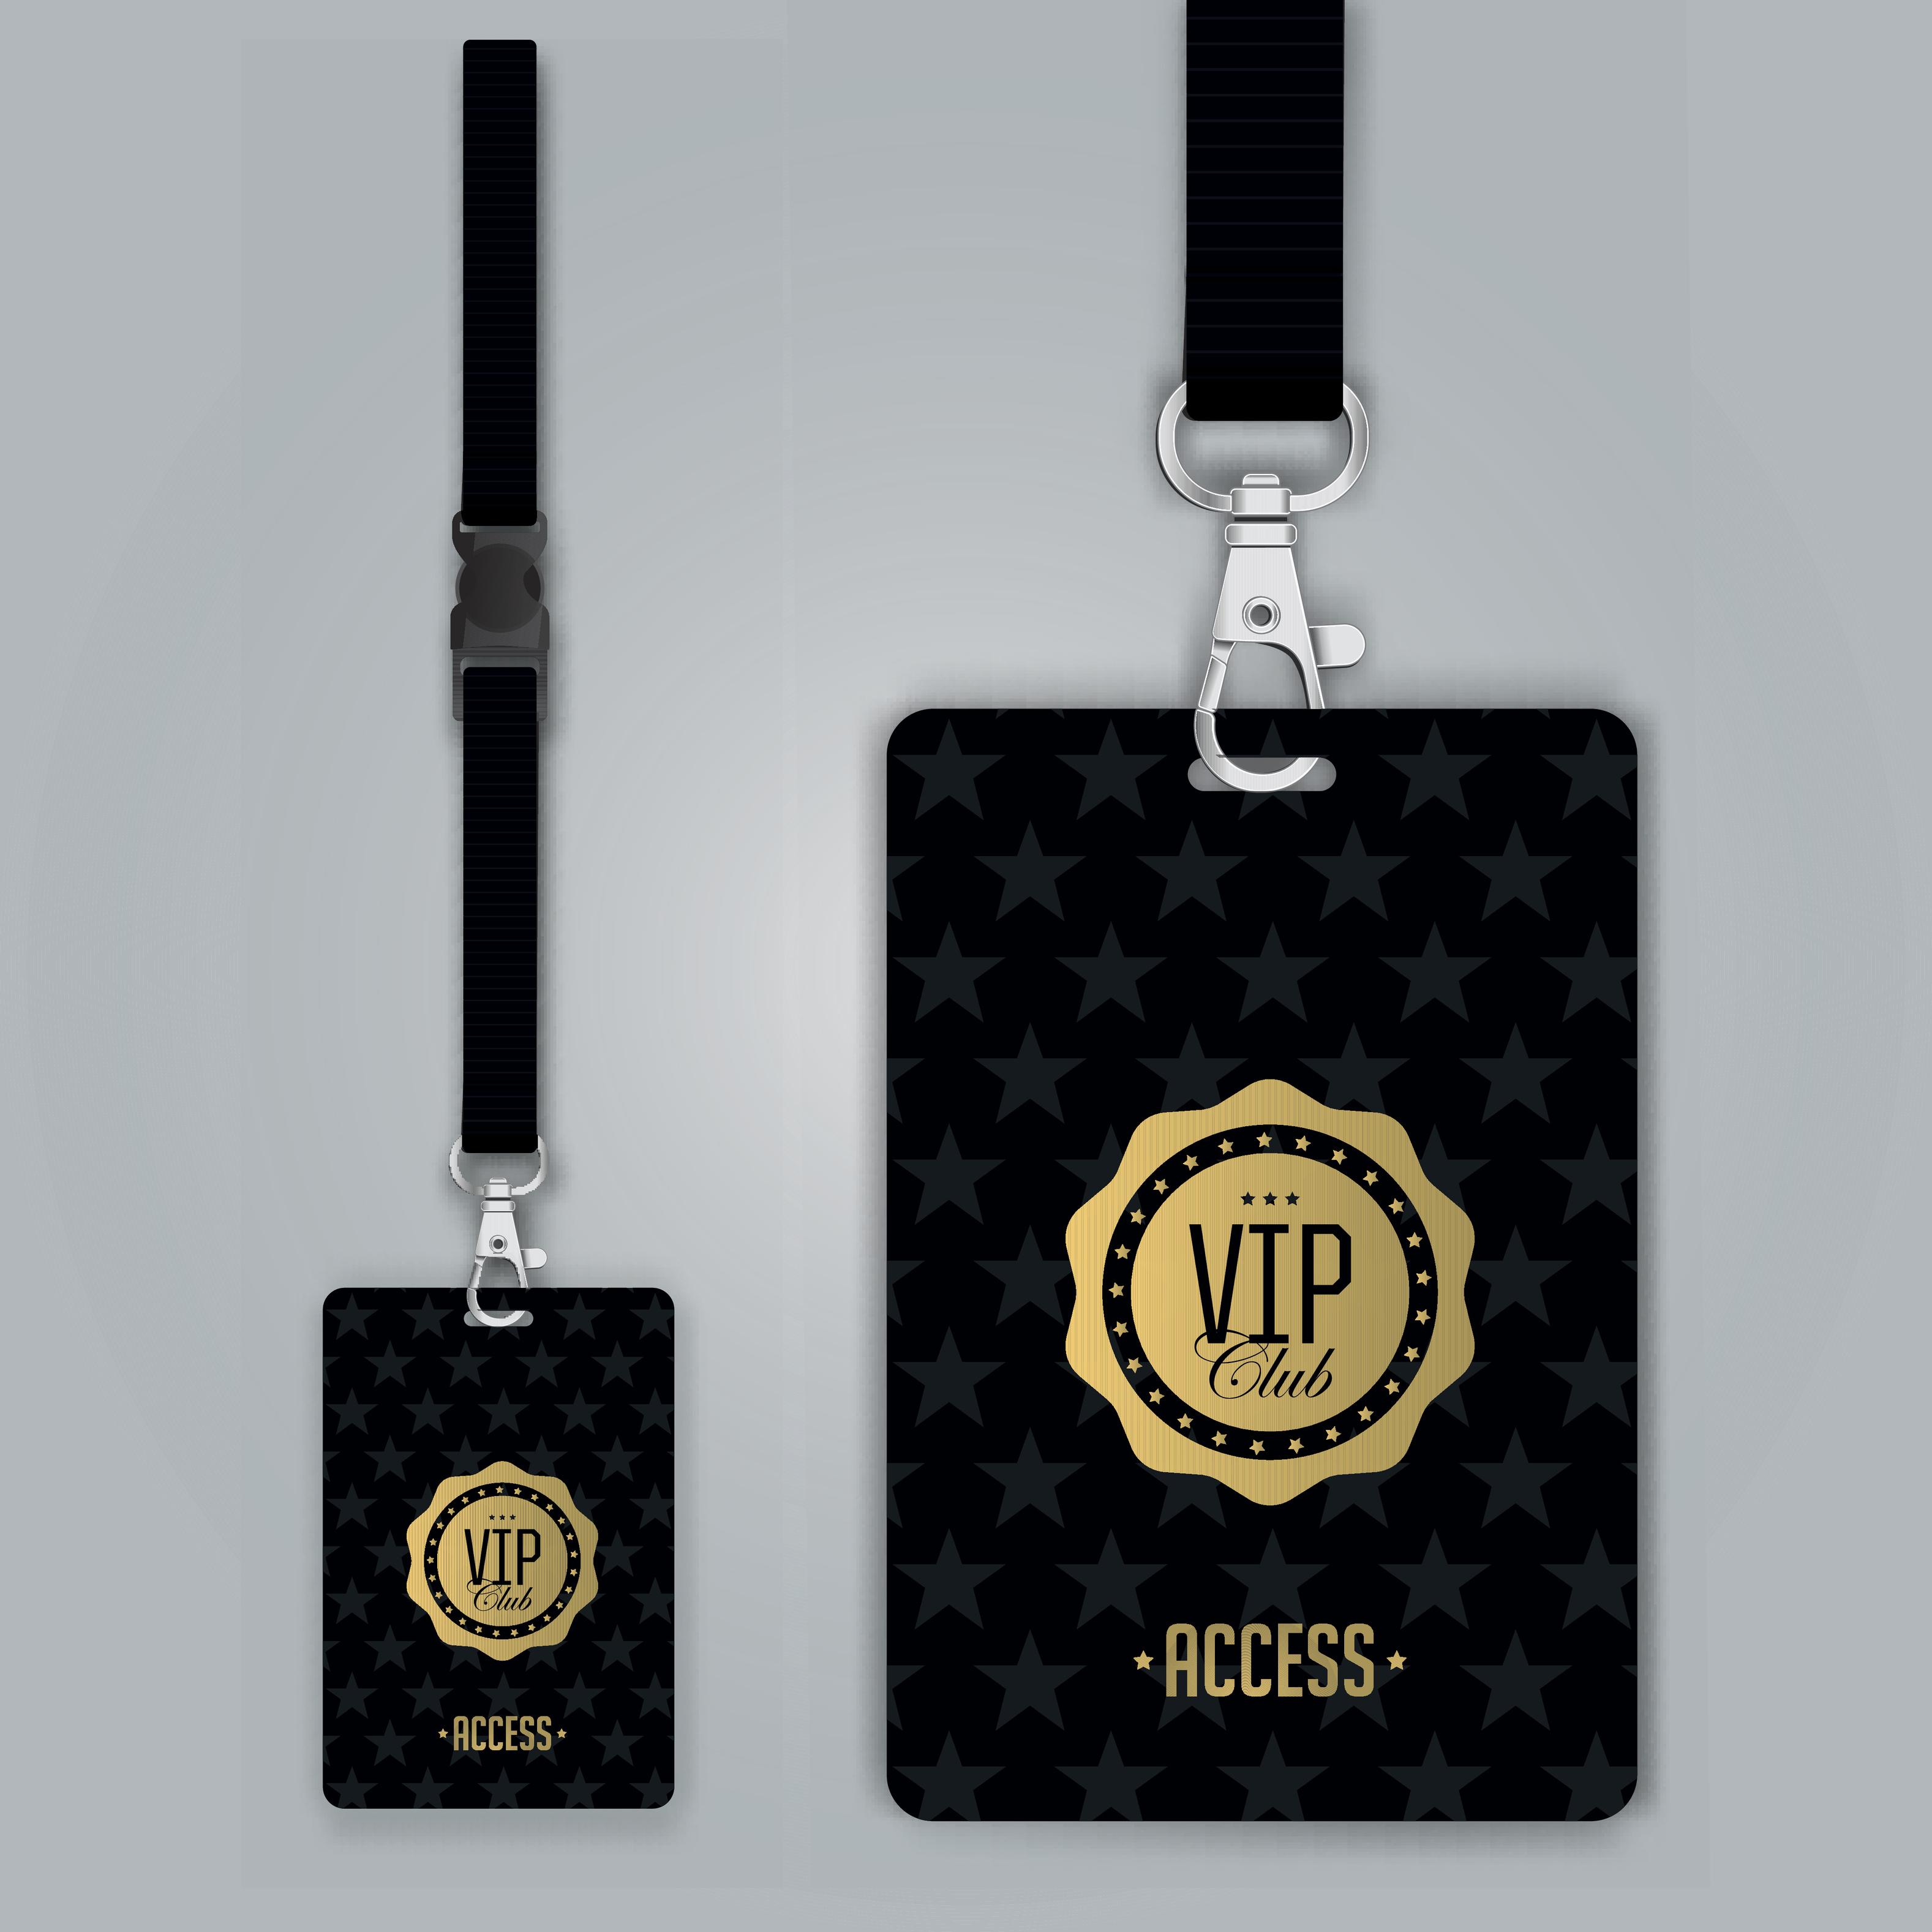 SHRM 2018 VIP